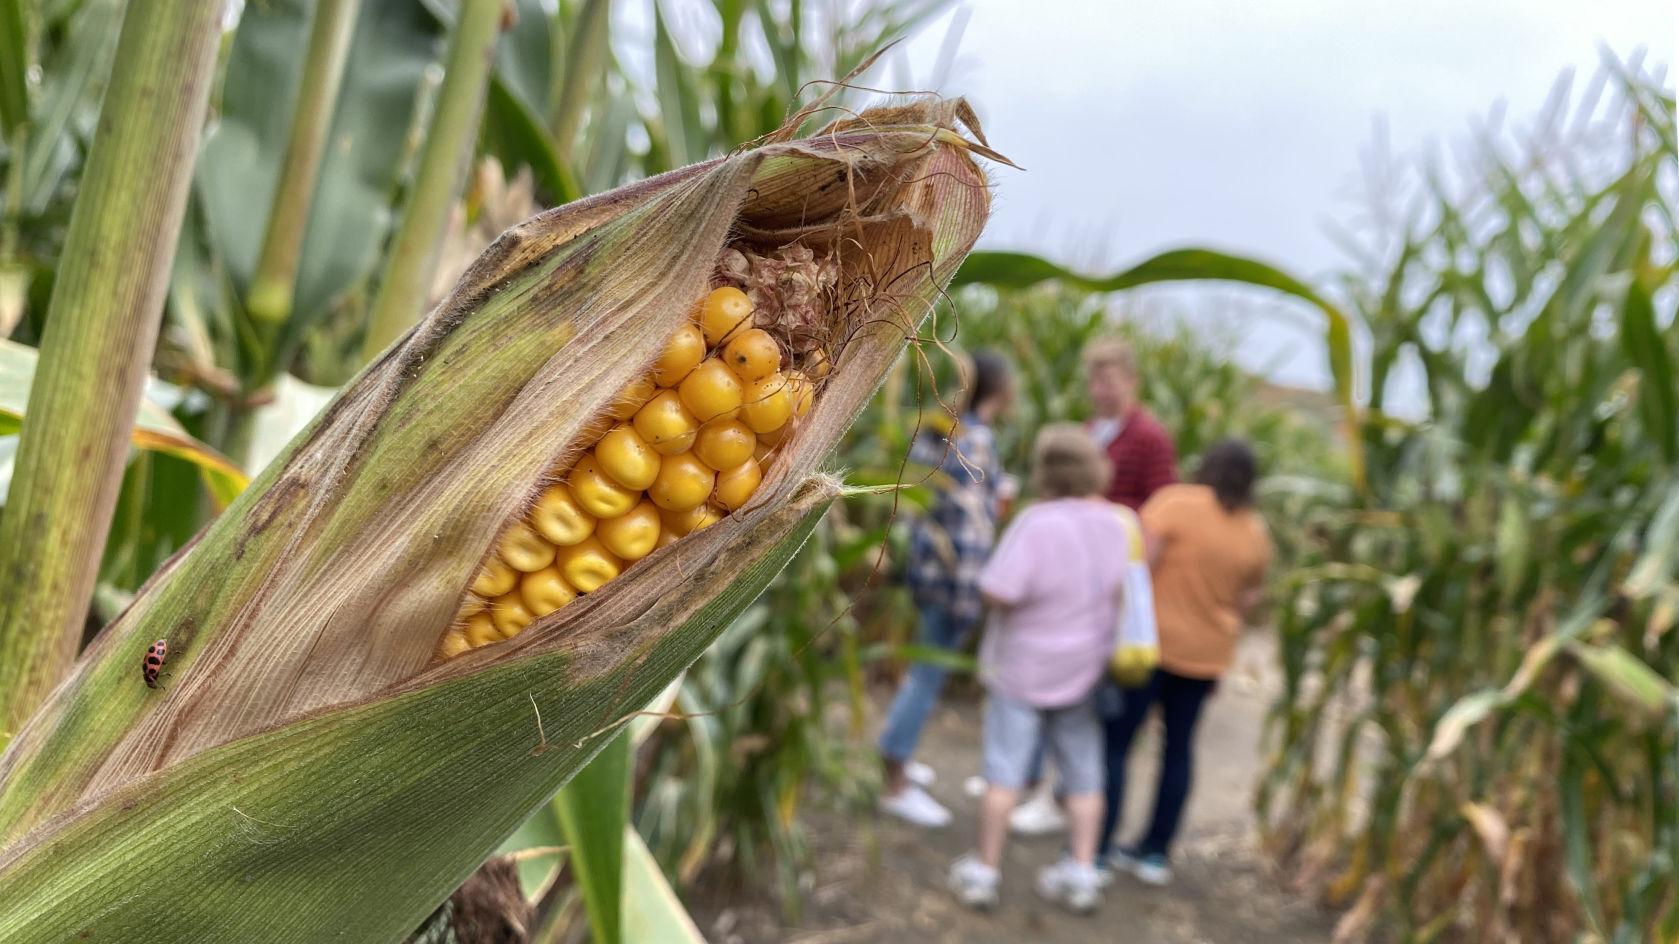 Bridgewater agritourism ordinance change highlights growing industry